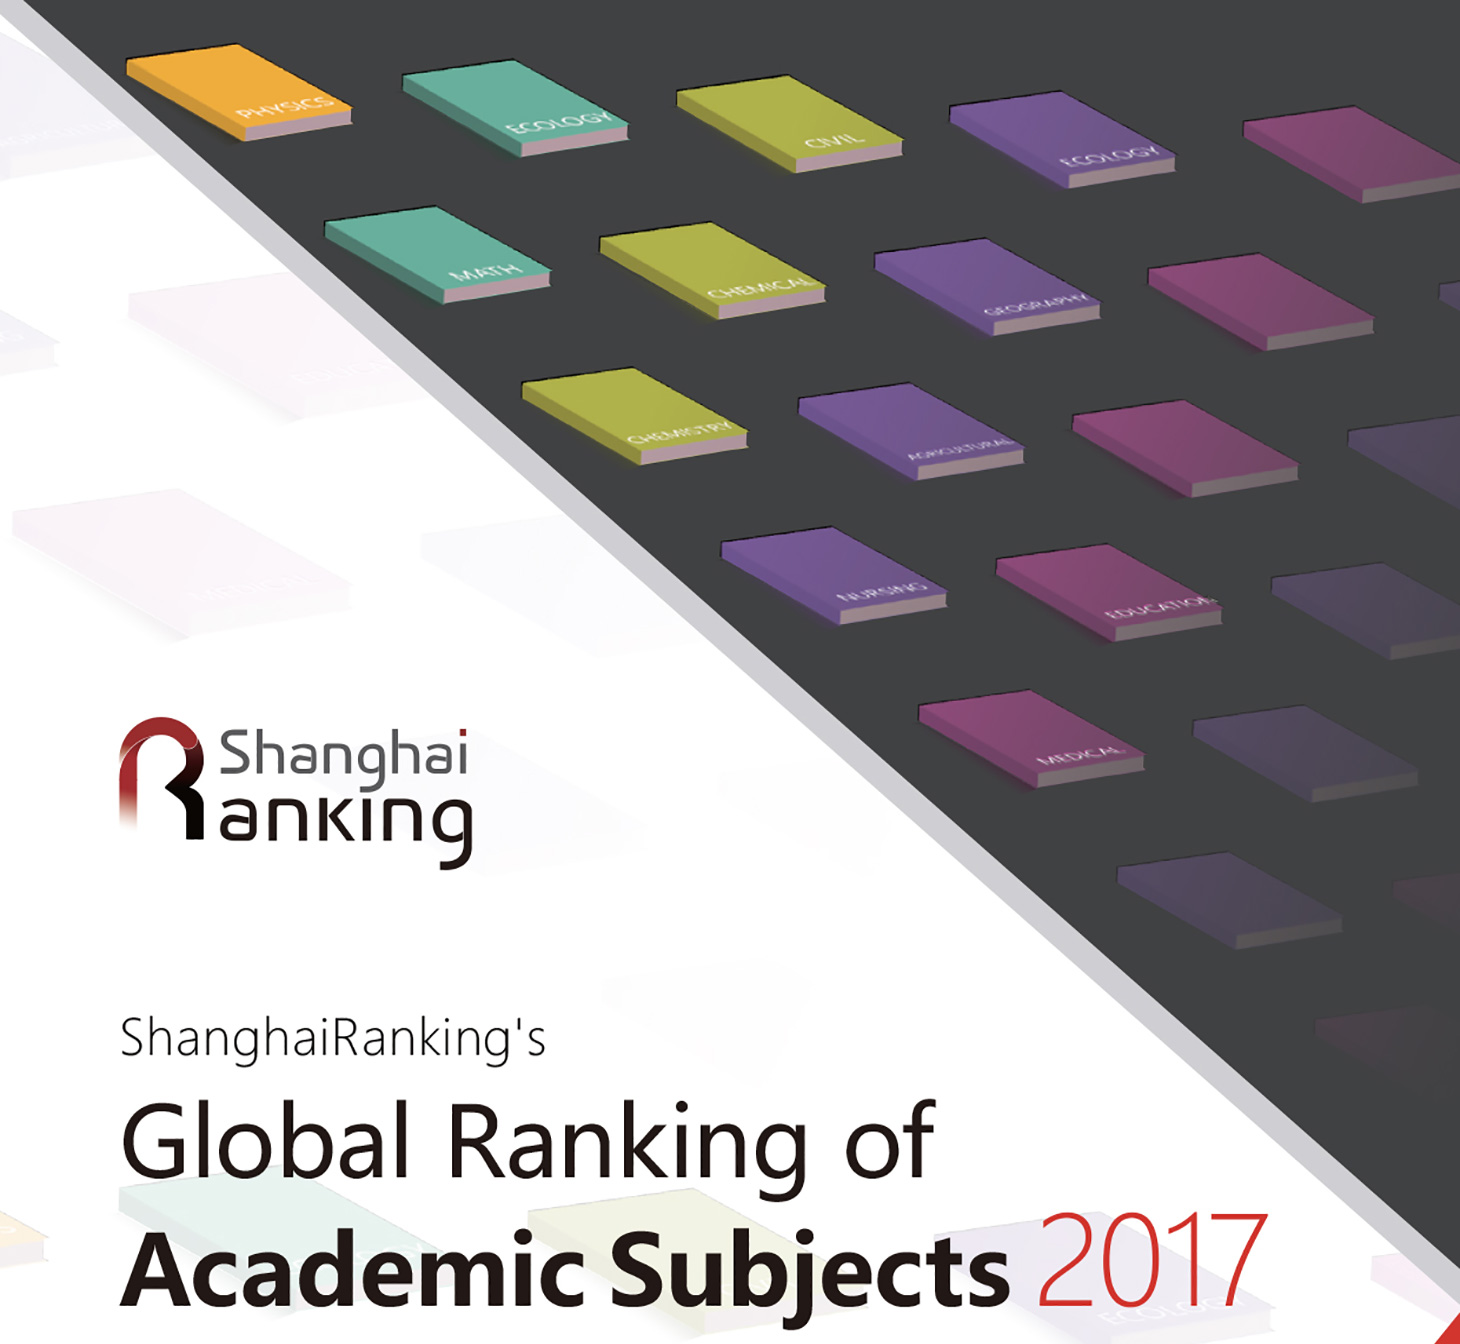 Classement de Shanghaï 2017 - Visuel des classements thématiques